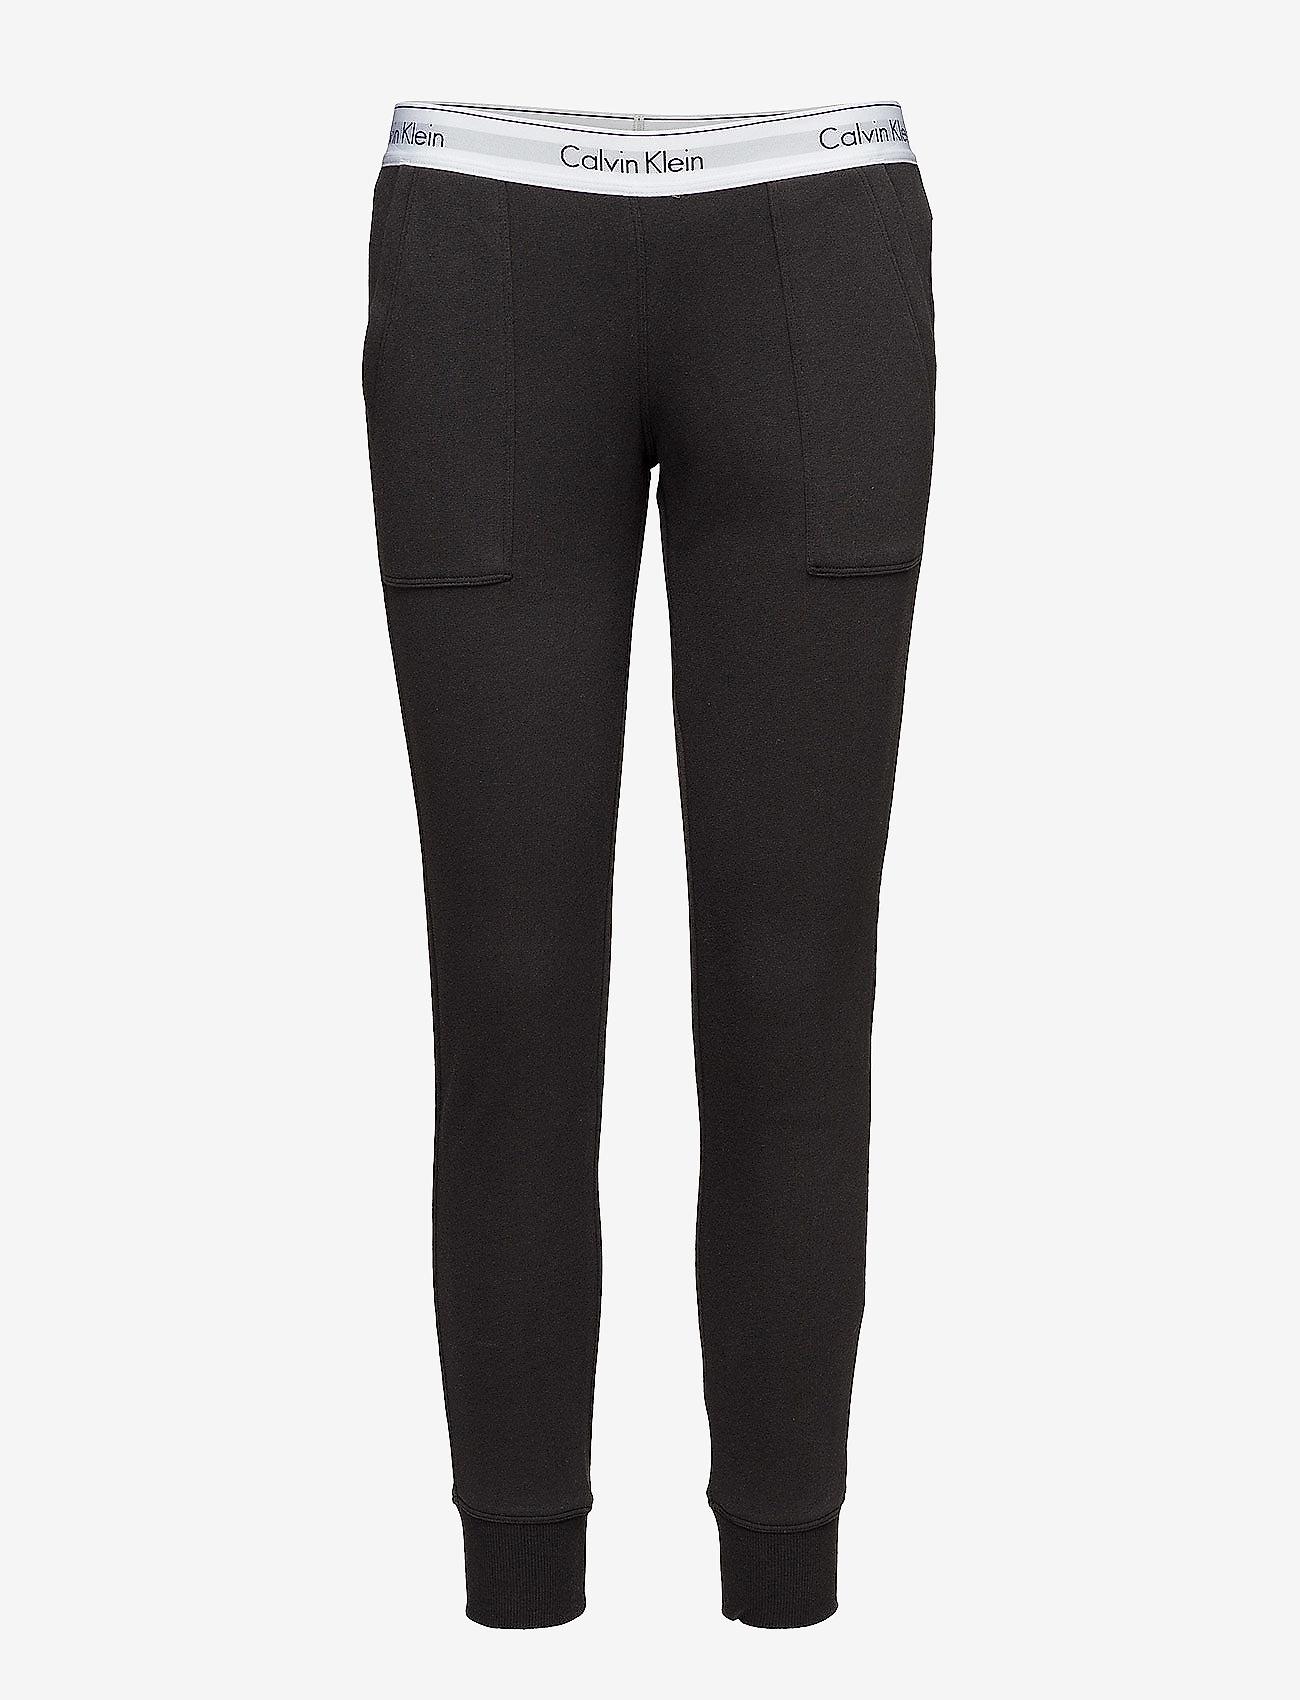 Calvin Klein - BOTTOM PANT JOGGER - doły - black - 0